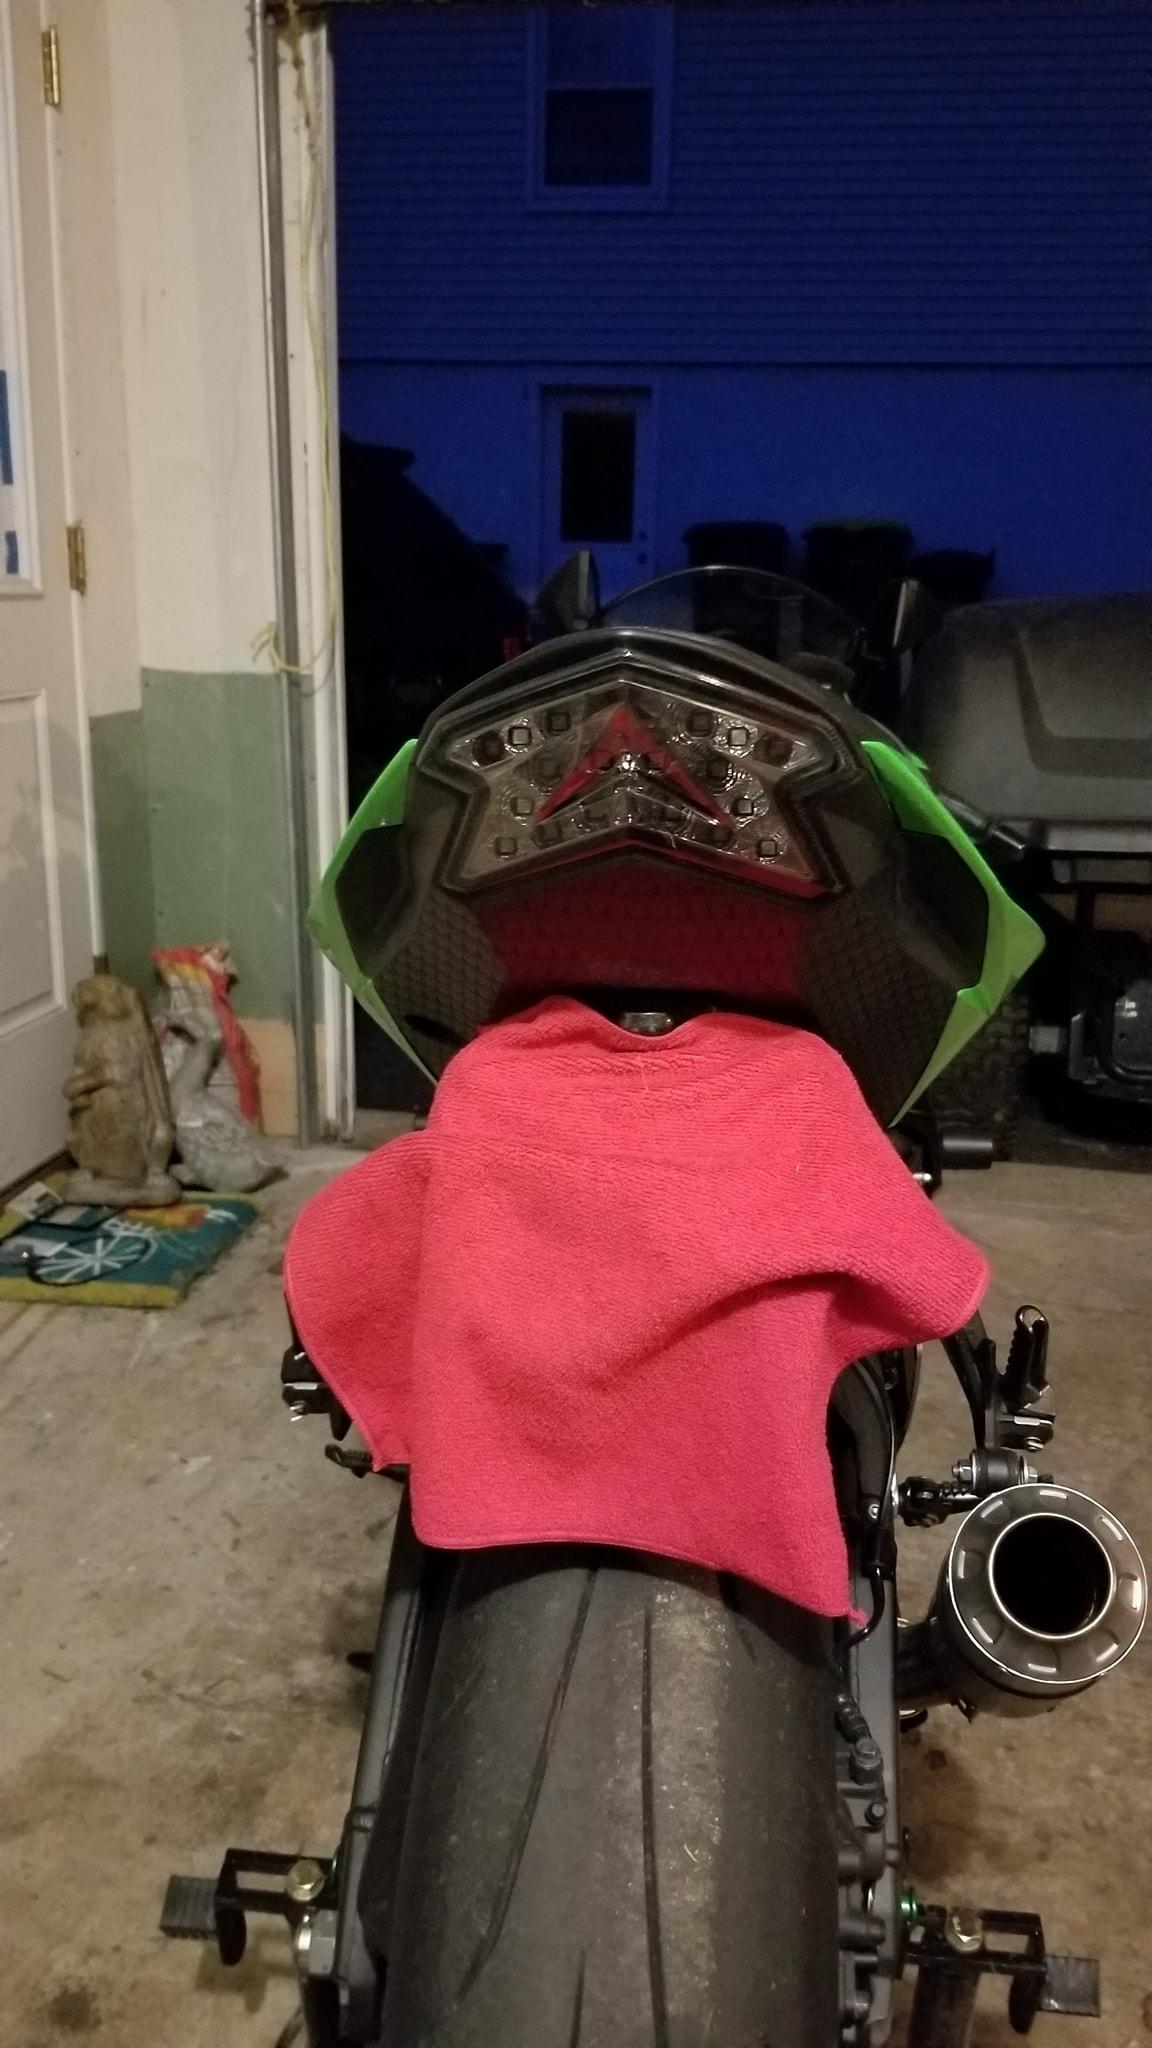 Dead battery after riding - ZX6R Forum